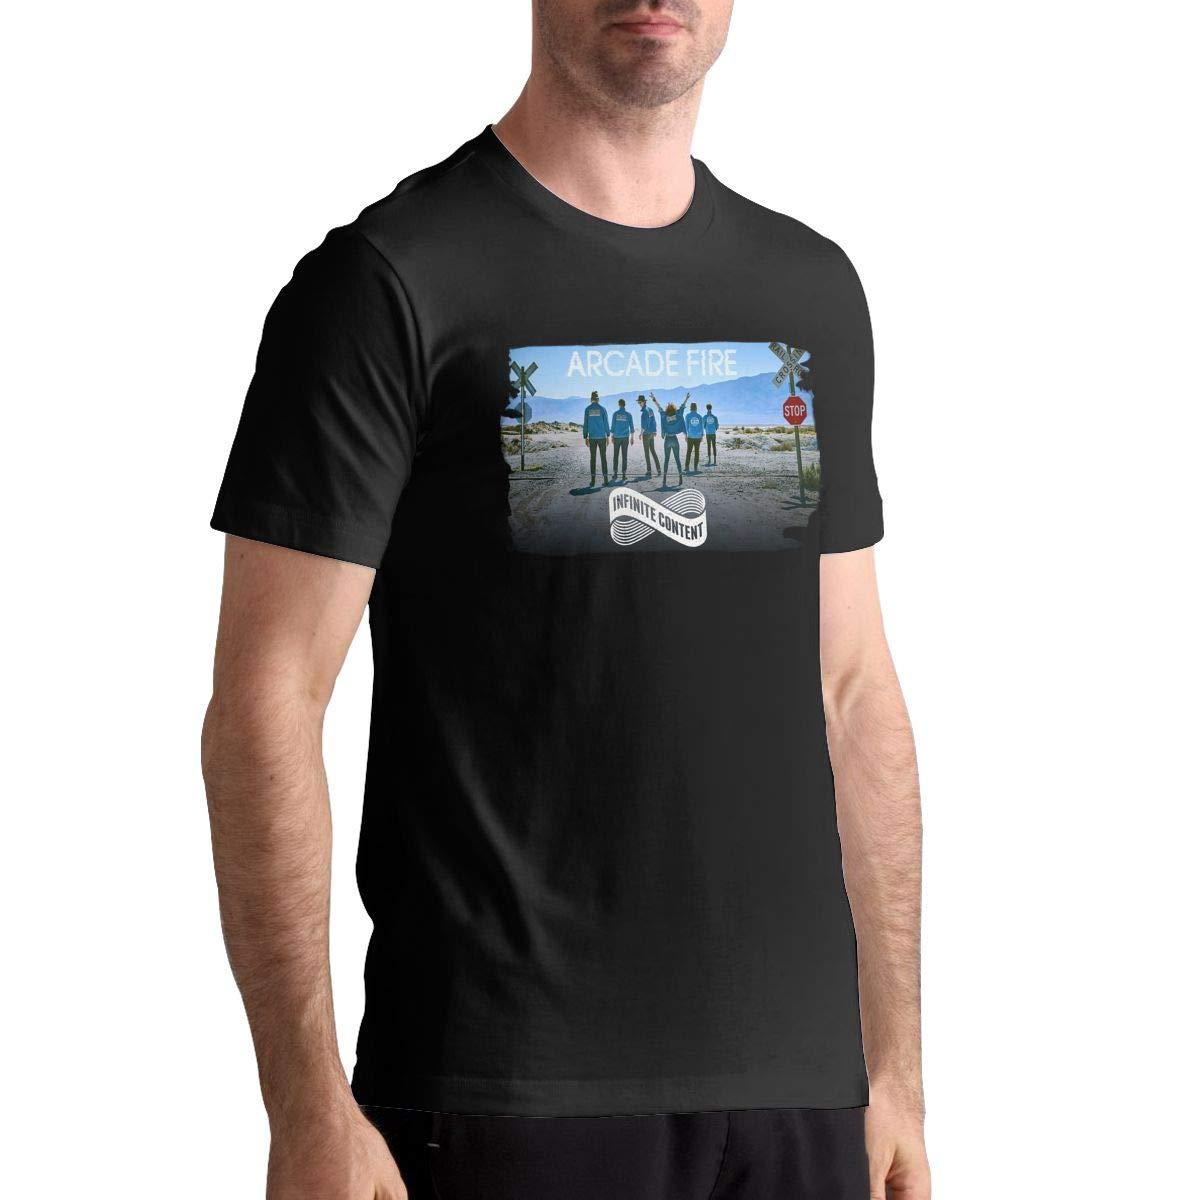 Hye D Riche Arcade Fire Mens Popular Short Sleeve Music Band T-Shirts Shirt Black